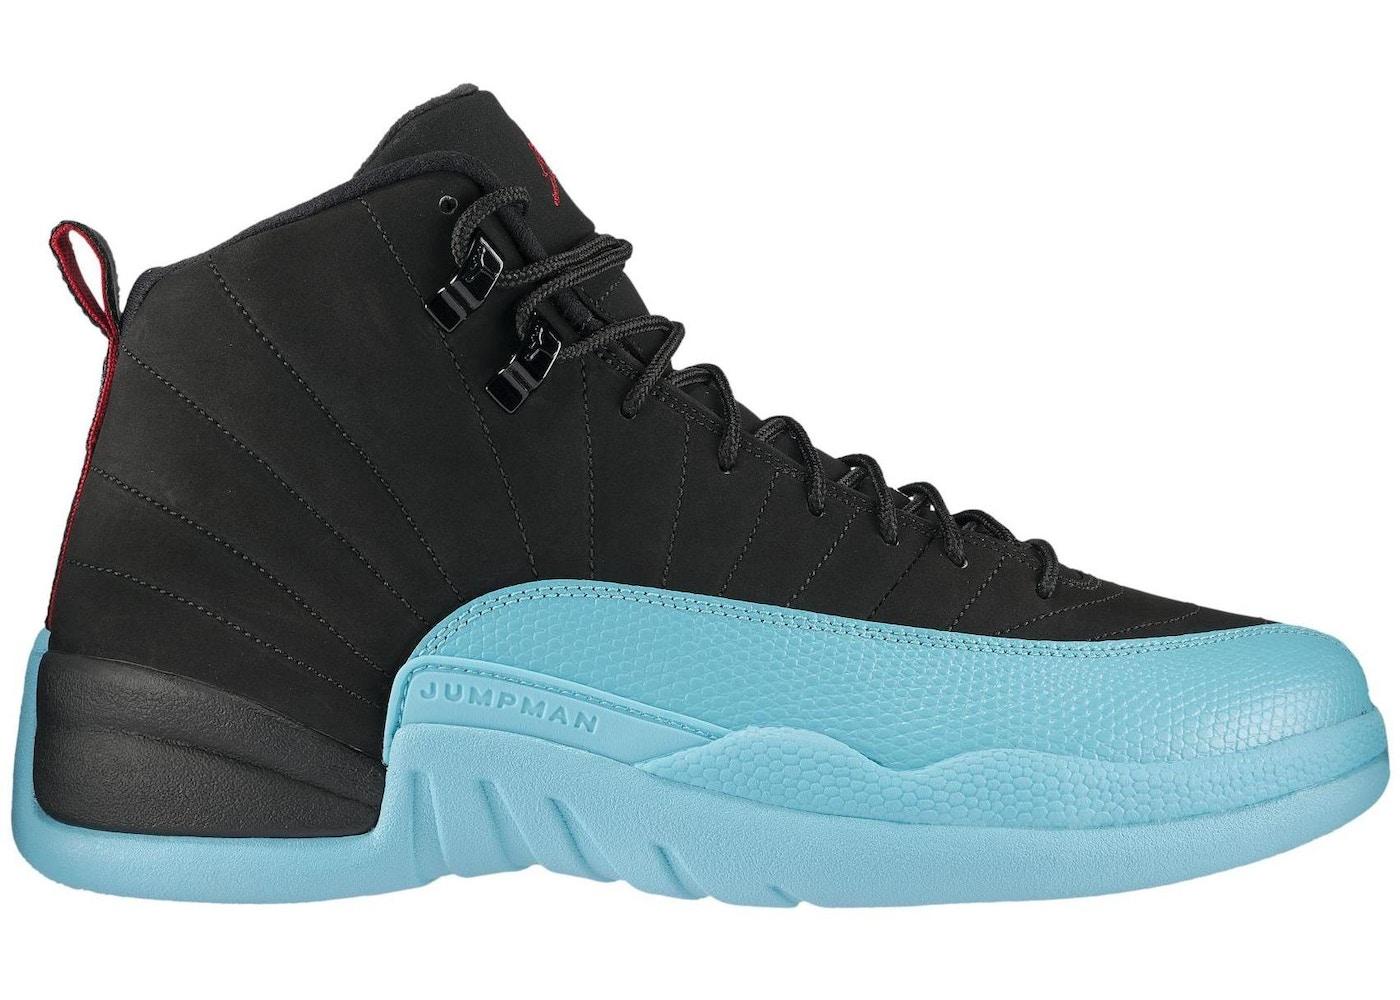 4bd4f4ab77c Buy Air Jordan 12 Size 18 Shoes & Deadstock Sneakers